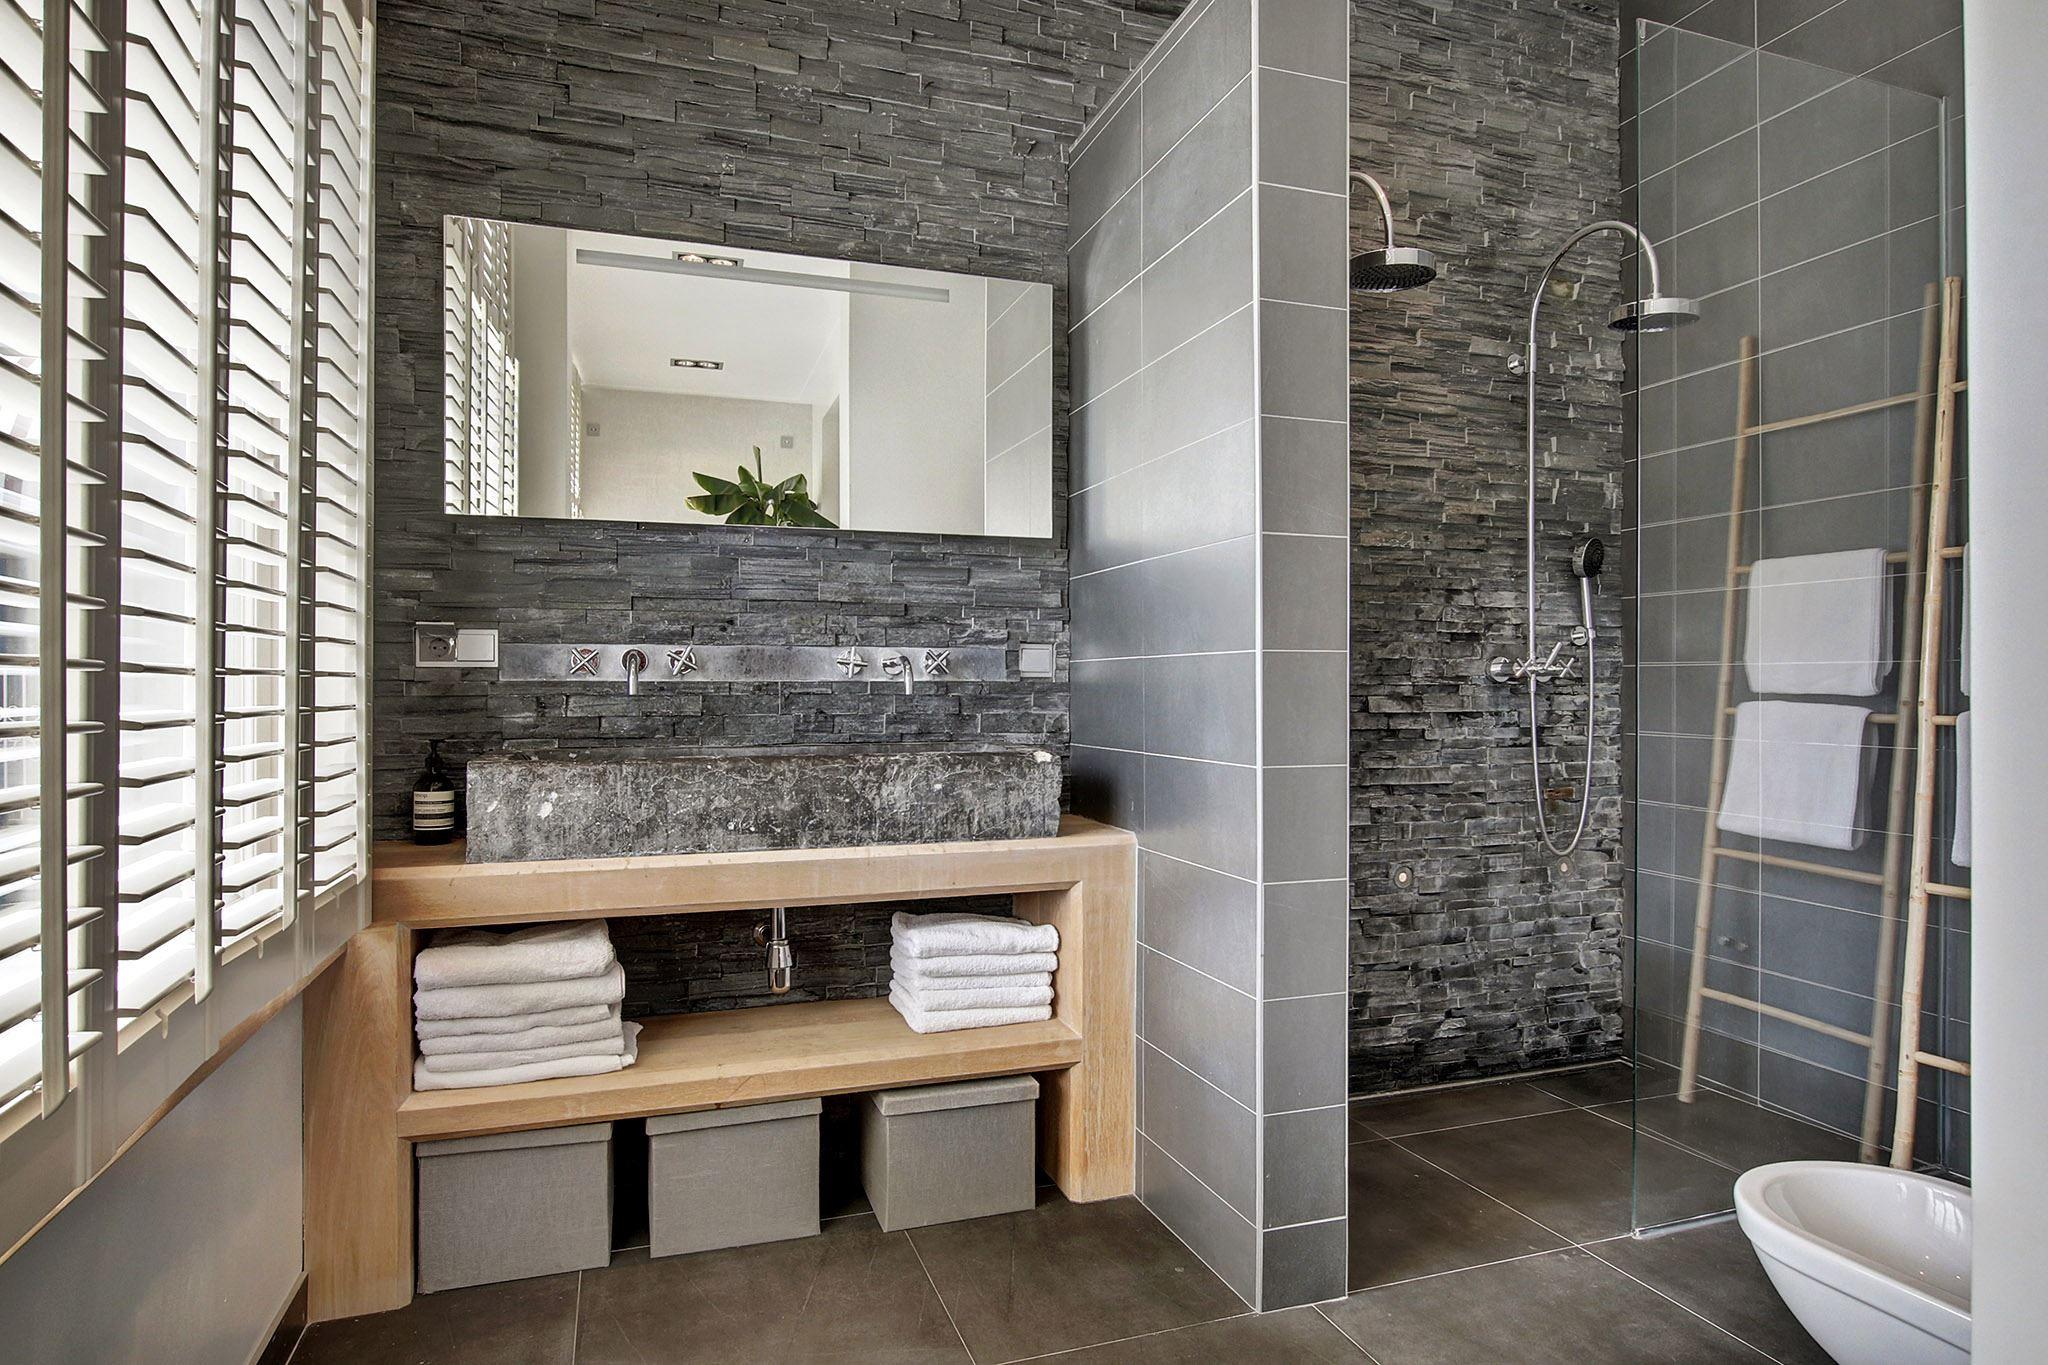 ванная комната санузел каменная стена каменная раковина встроенный смеситель душевая кабина лесенка